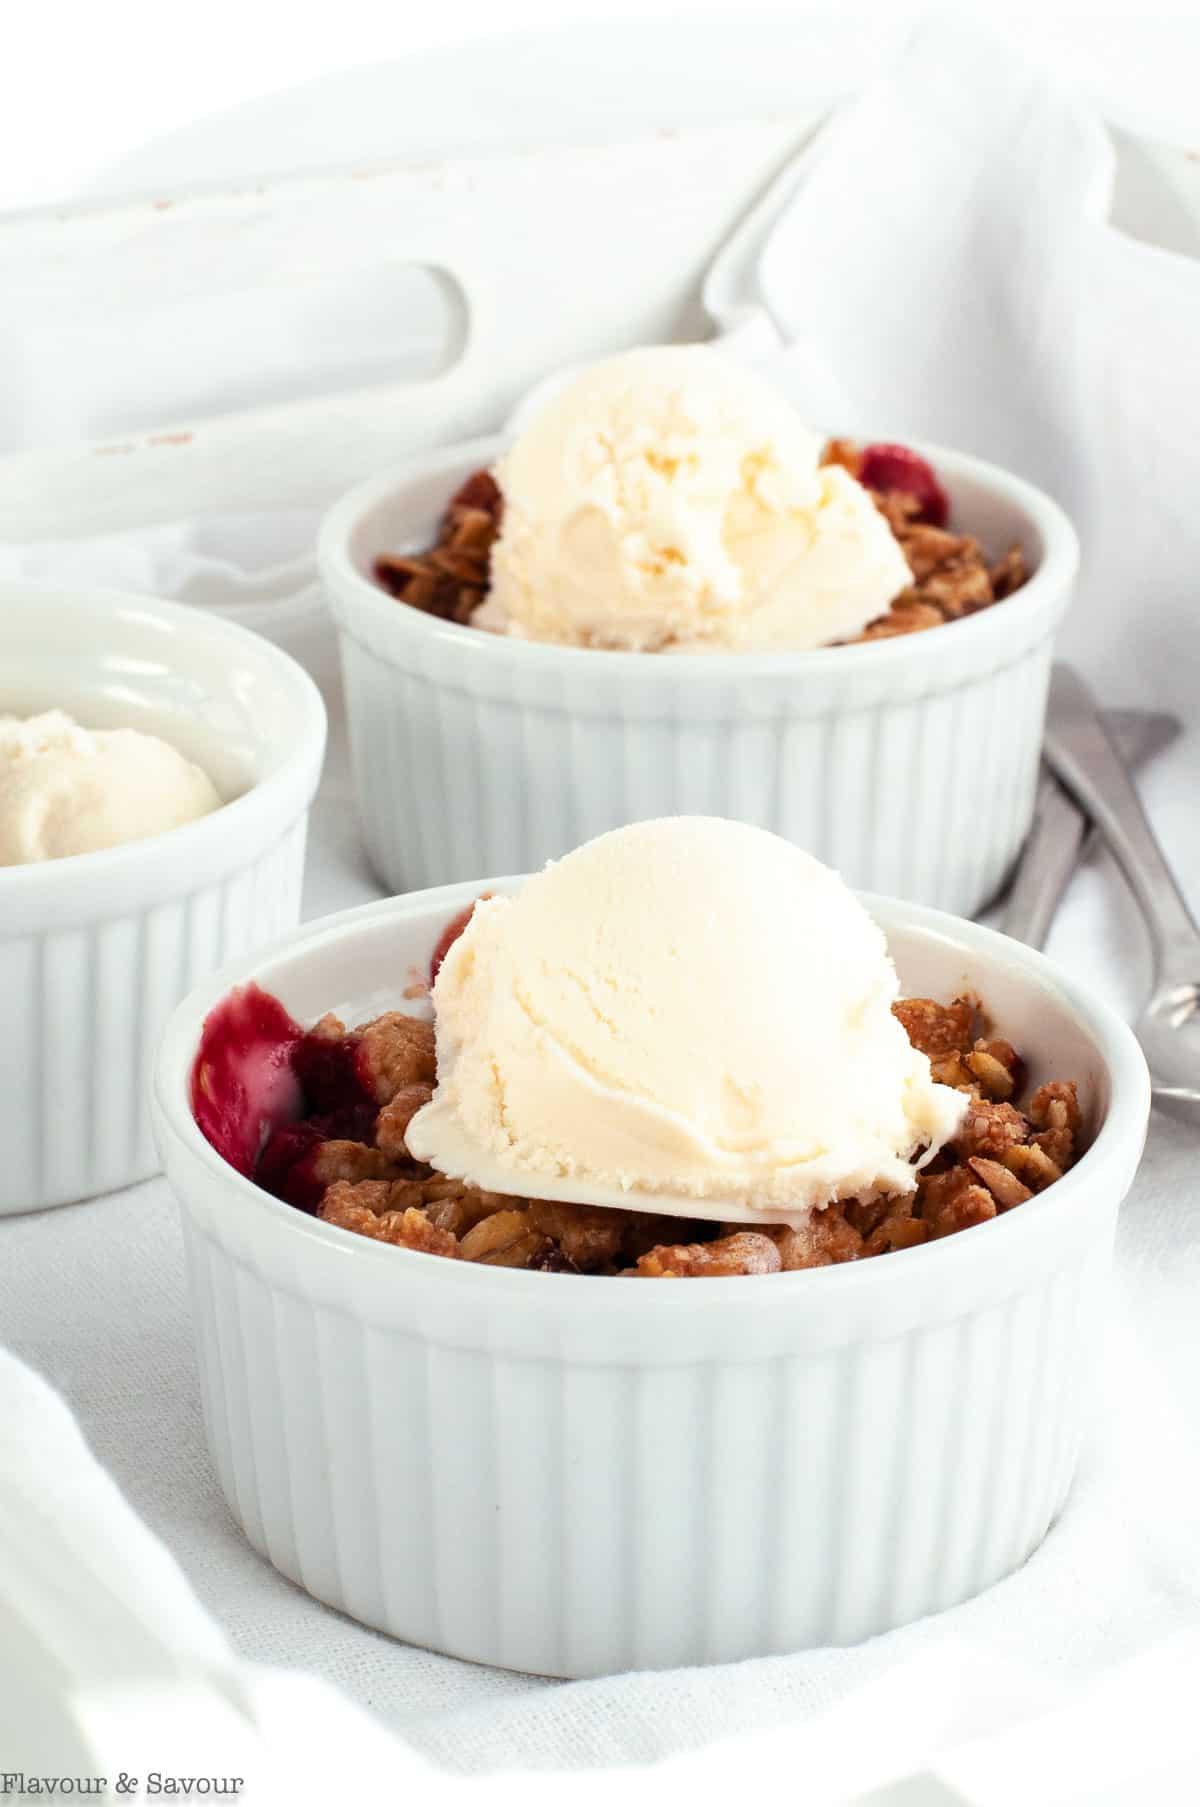 Two ramekins with mini Cherry Almond Crisp with ice cream